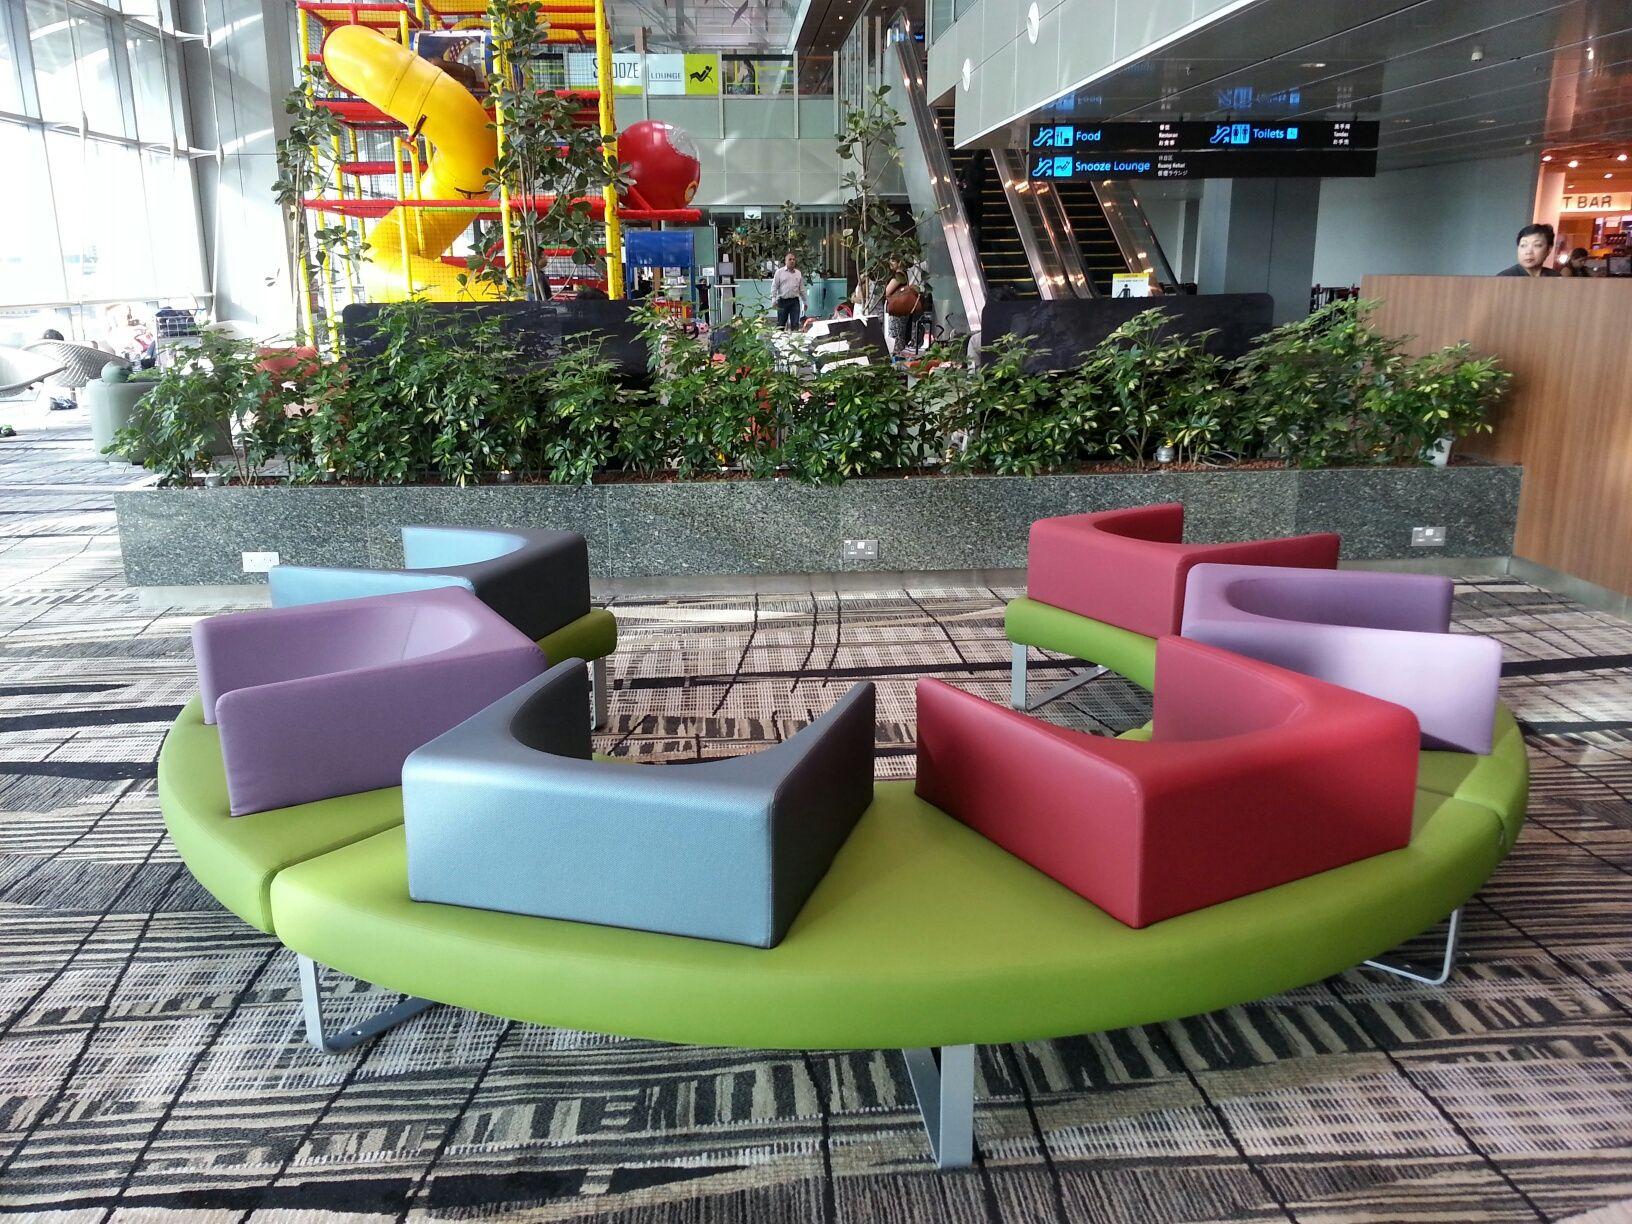 Ianus chairs, Changi Airport - Singapore | AirPort | Outdoor